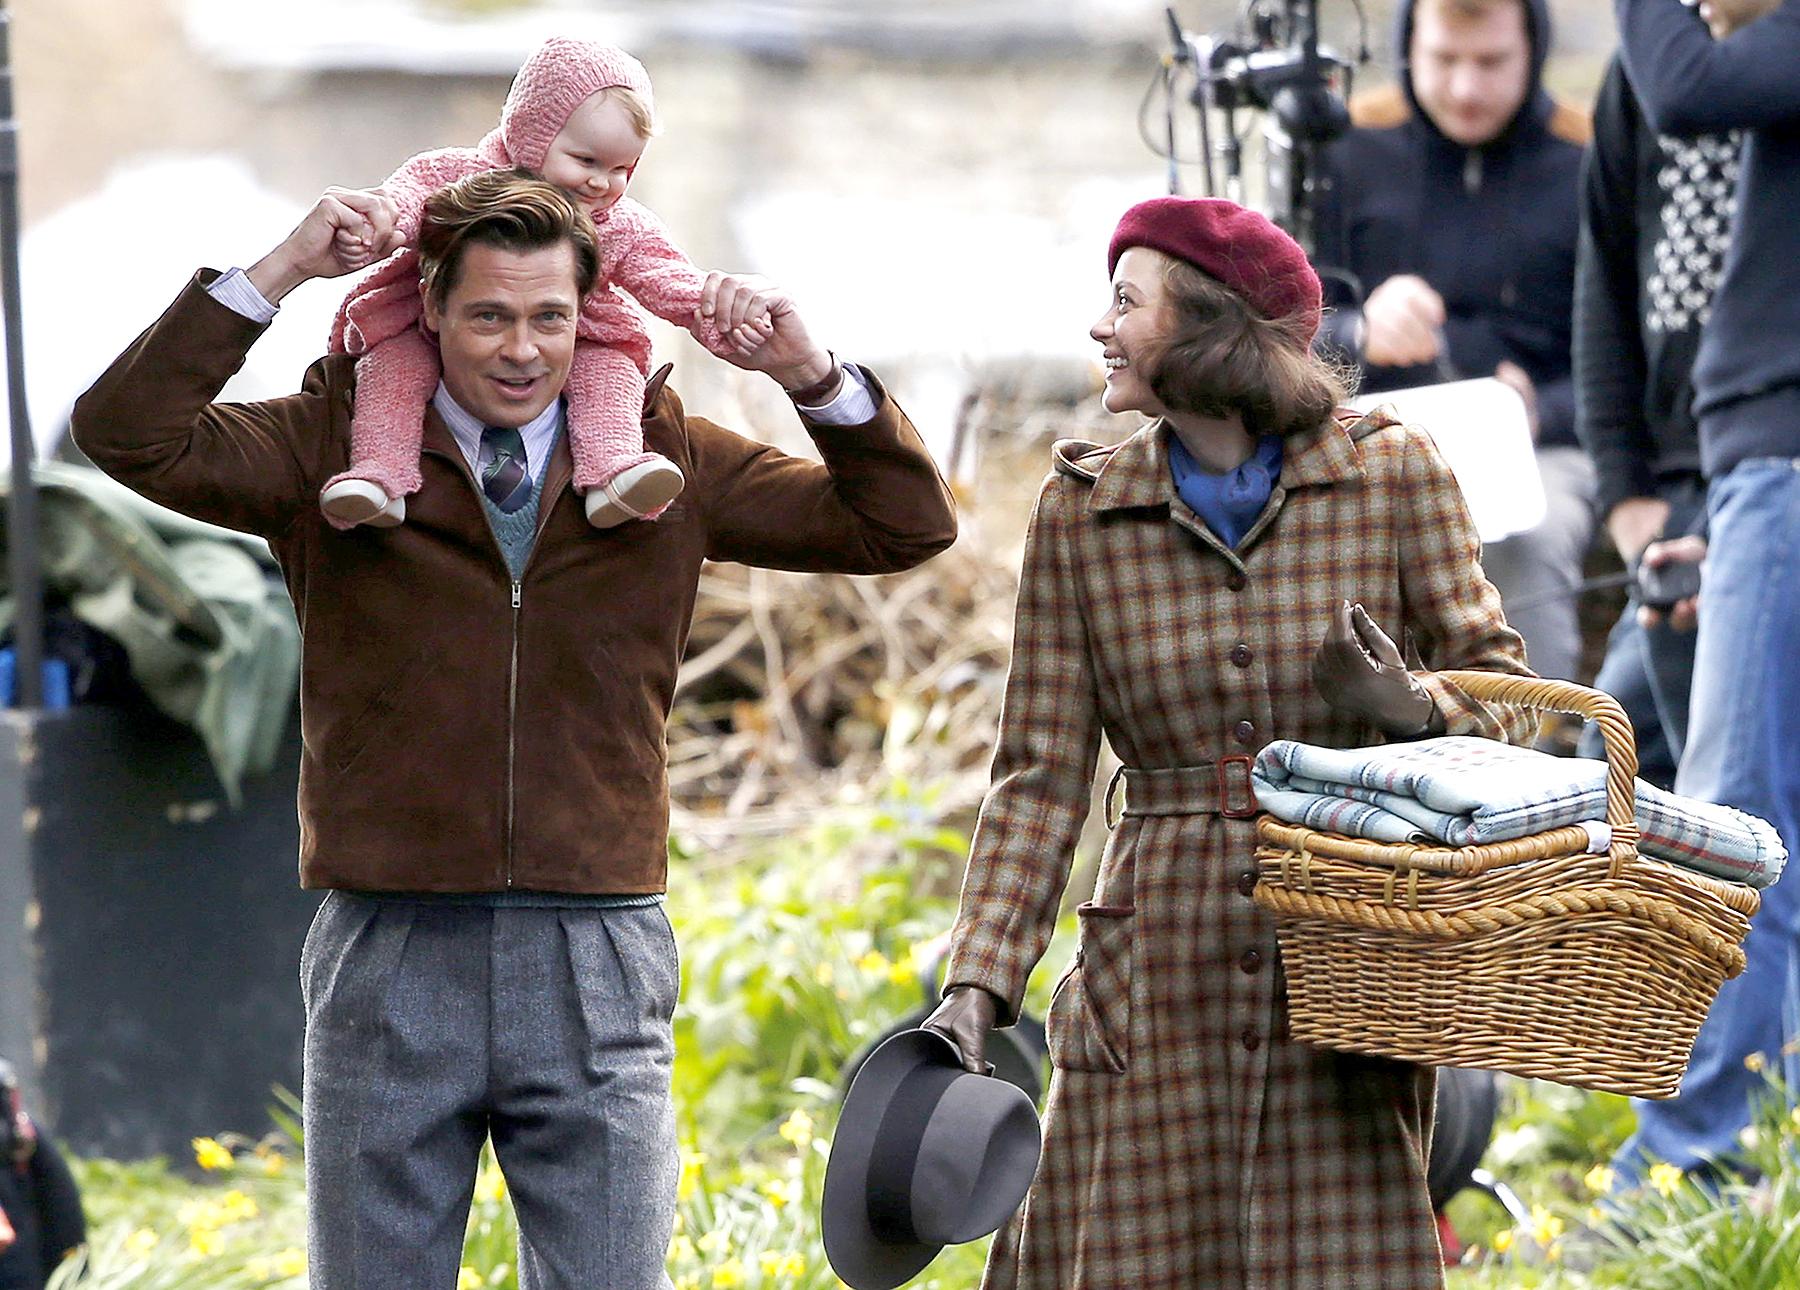 Brad Pitt and Marion Cotillard filming in London.